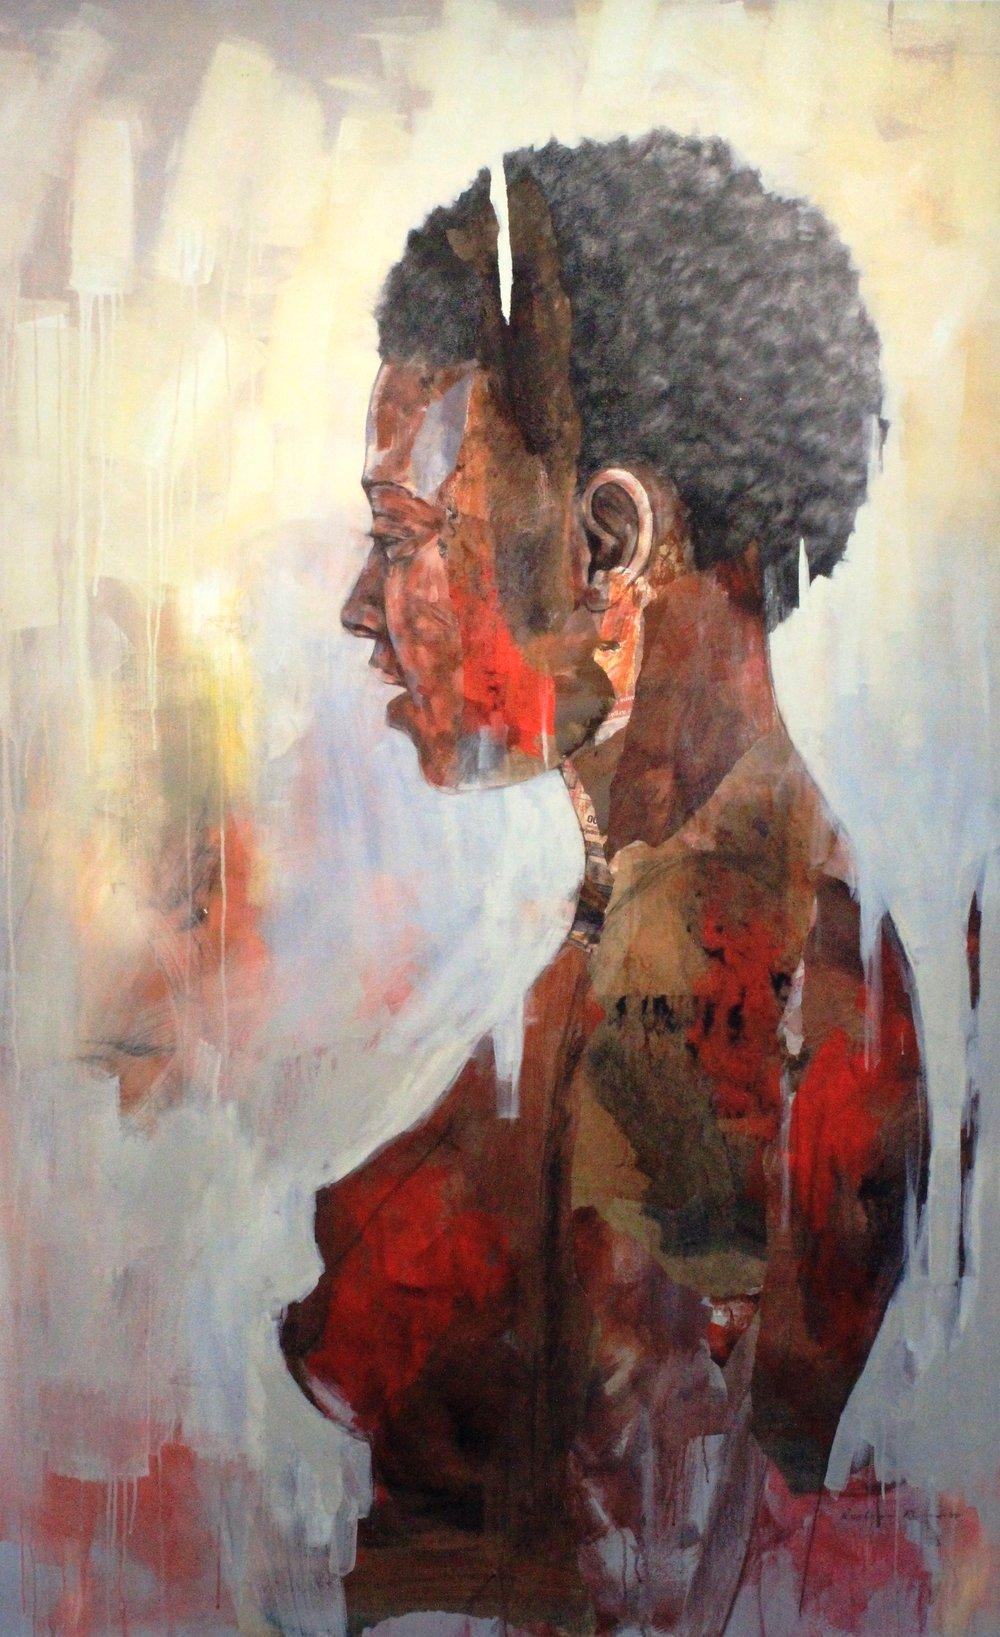 ' Kusalahigwa'   Restone Maambo  Collage and Mixed Media on canvas  2060 x 1960 x 40 mm  2018